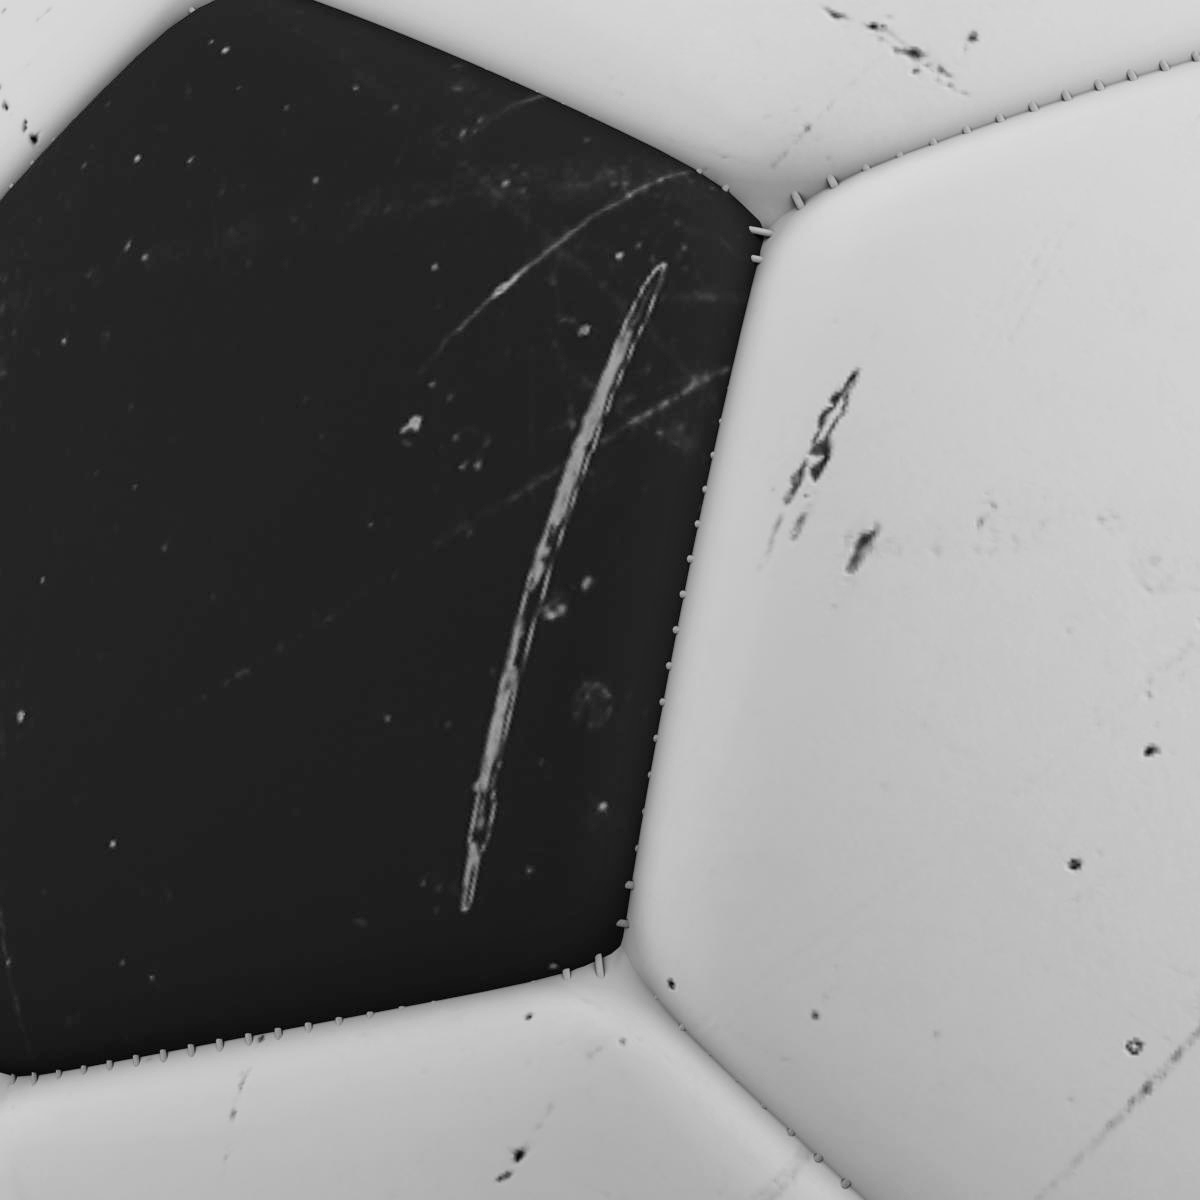 soccerball black white 3d model 3ds max fbx c4d ma mb obj 203953